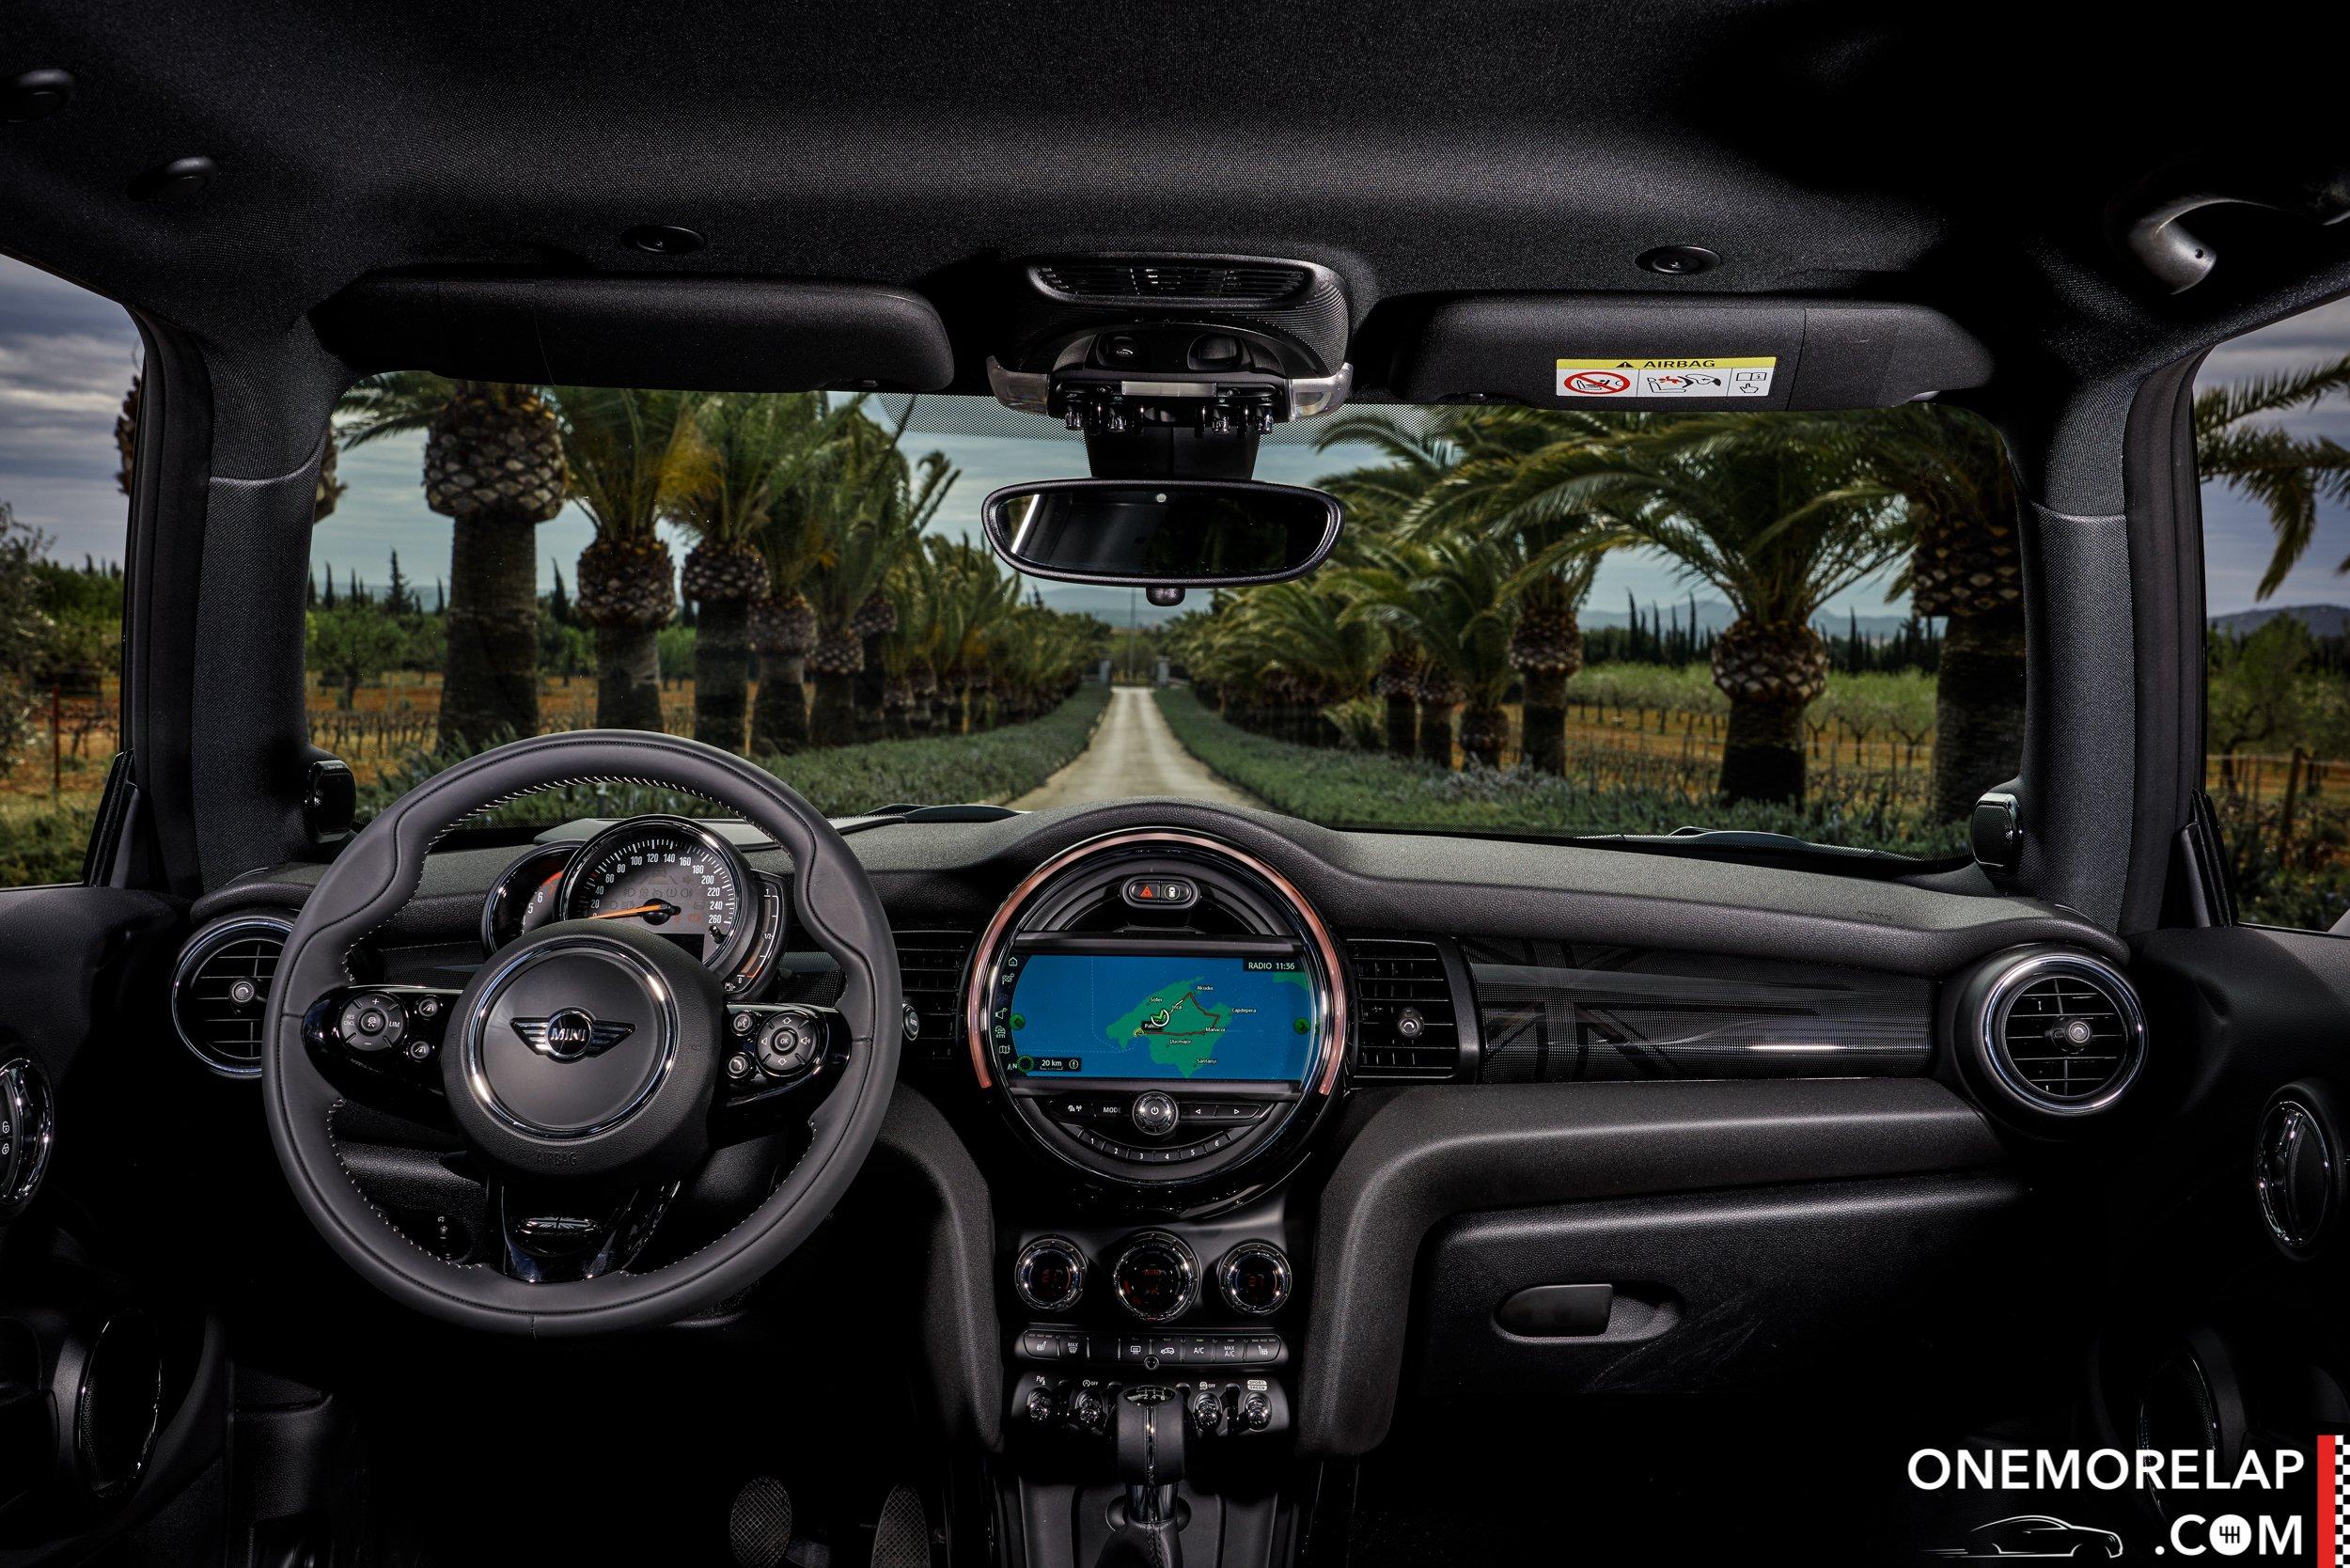 Kurztest: MINI Cooper S F56 mit DKG